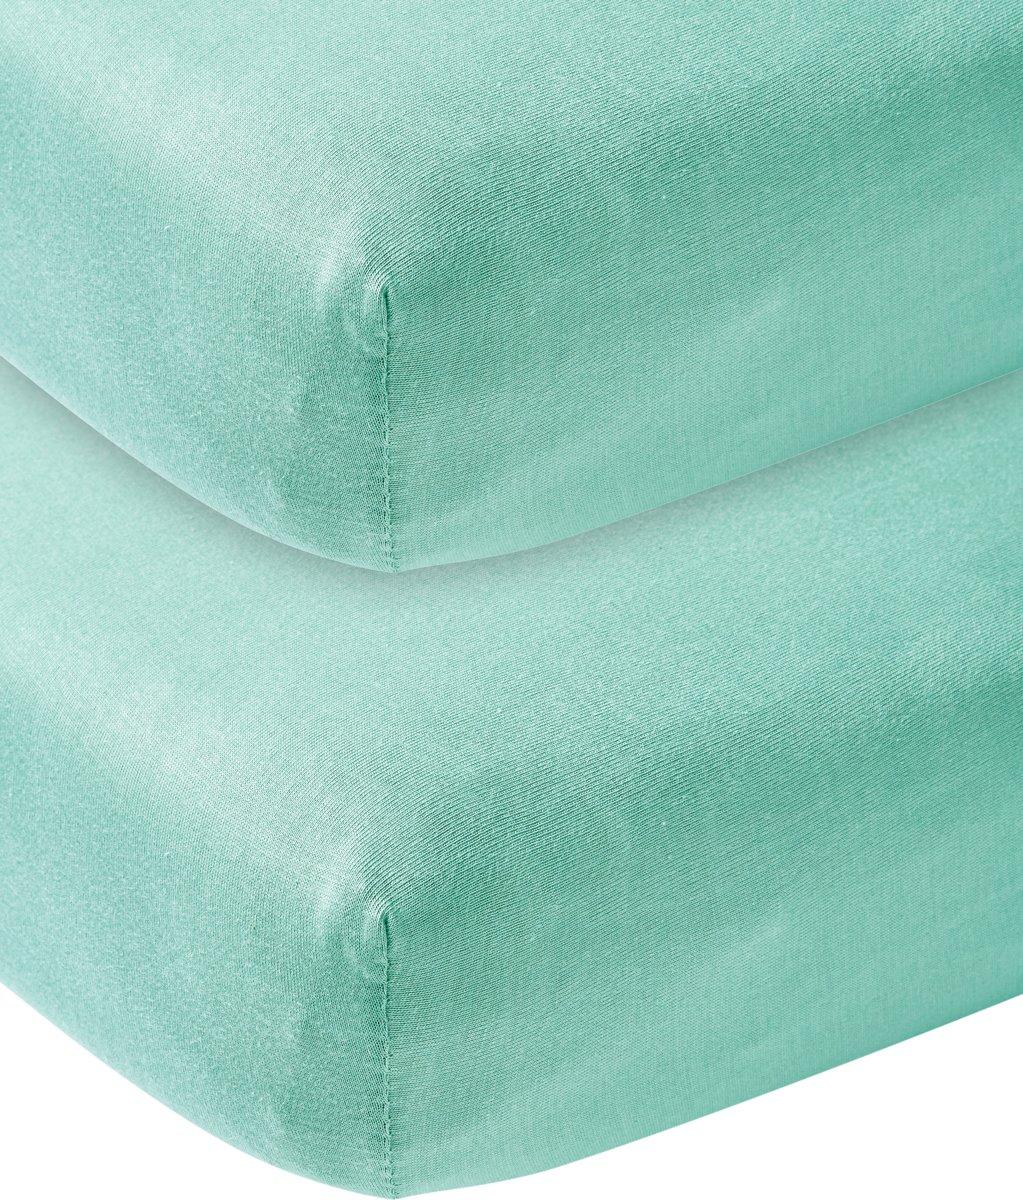 Meyco jersey hoeslaken 2-pack - 70x140/150 - new mint